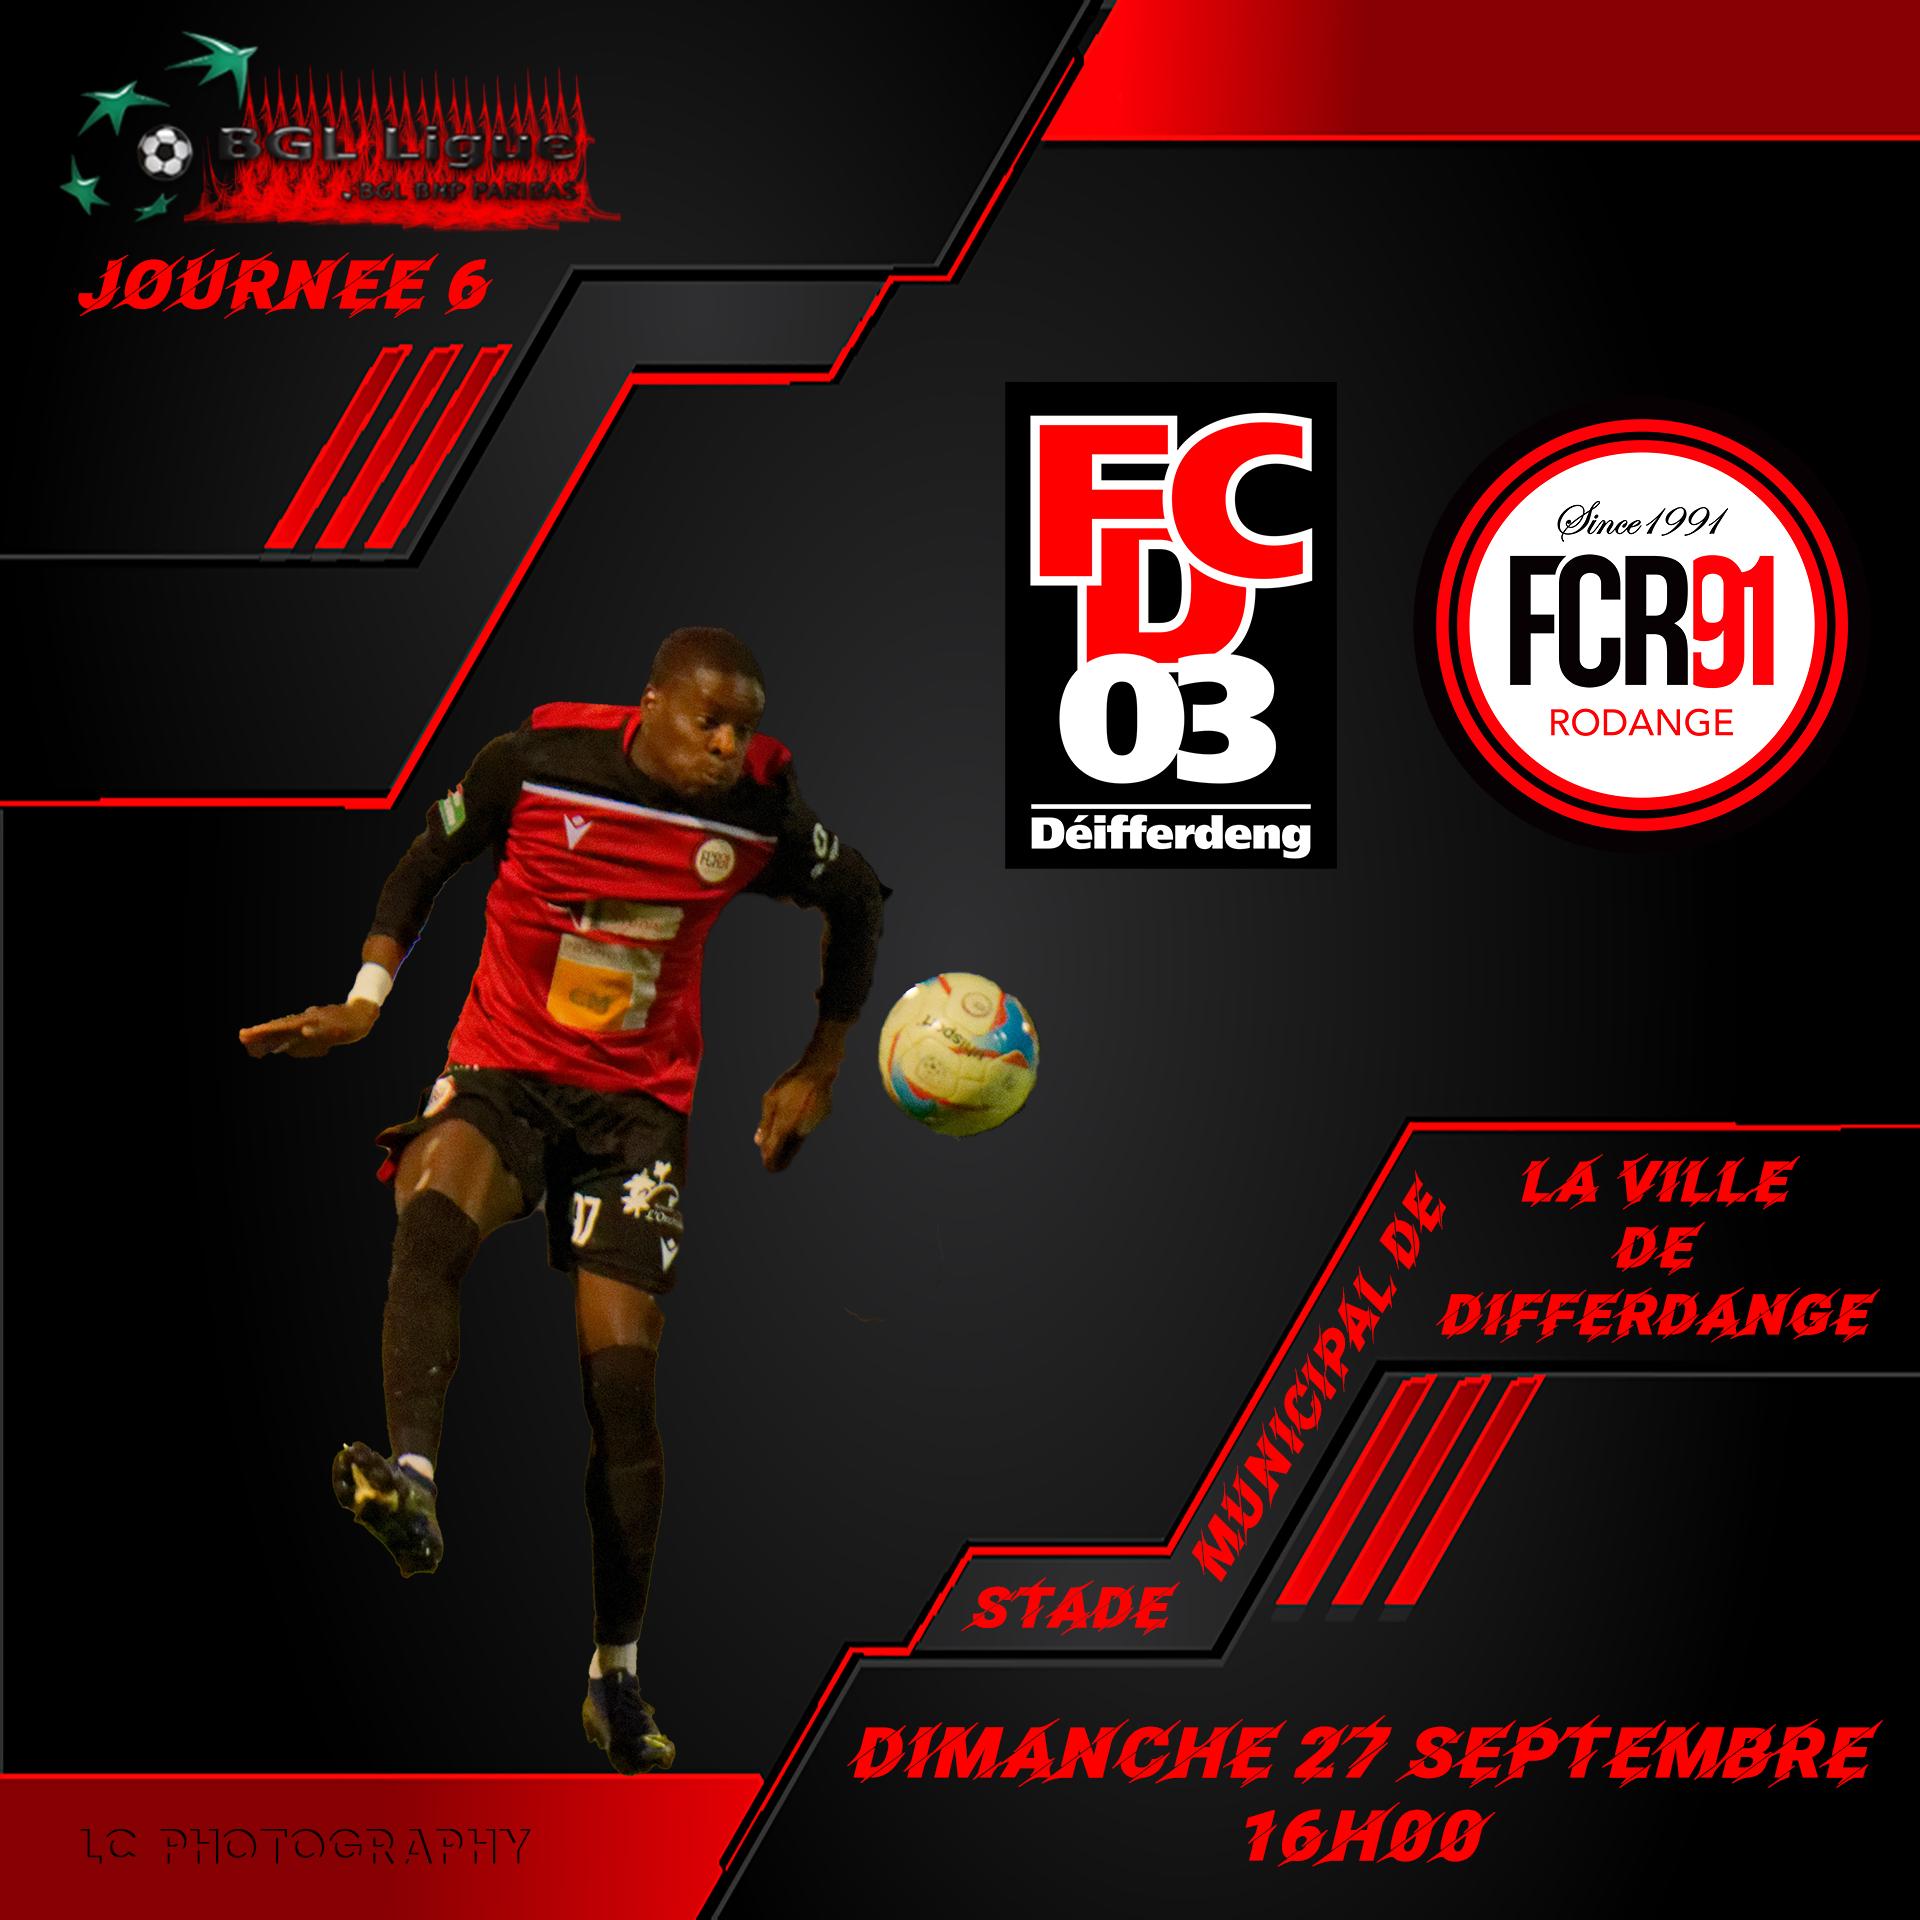 FC Differdange 03 - FC Rodange 91